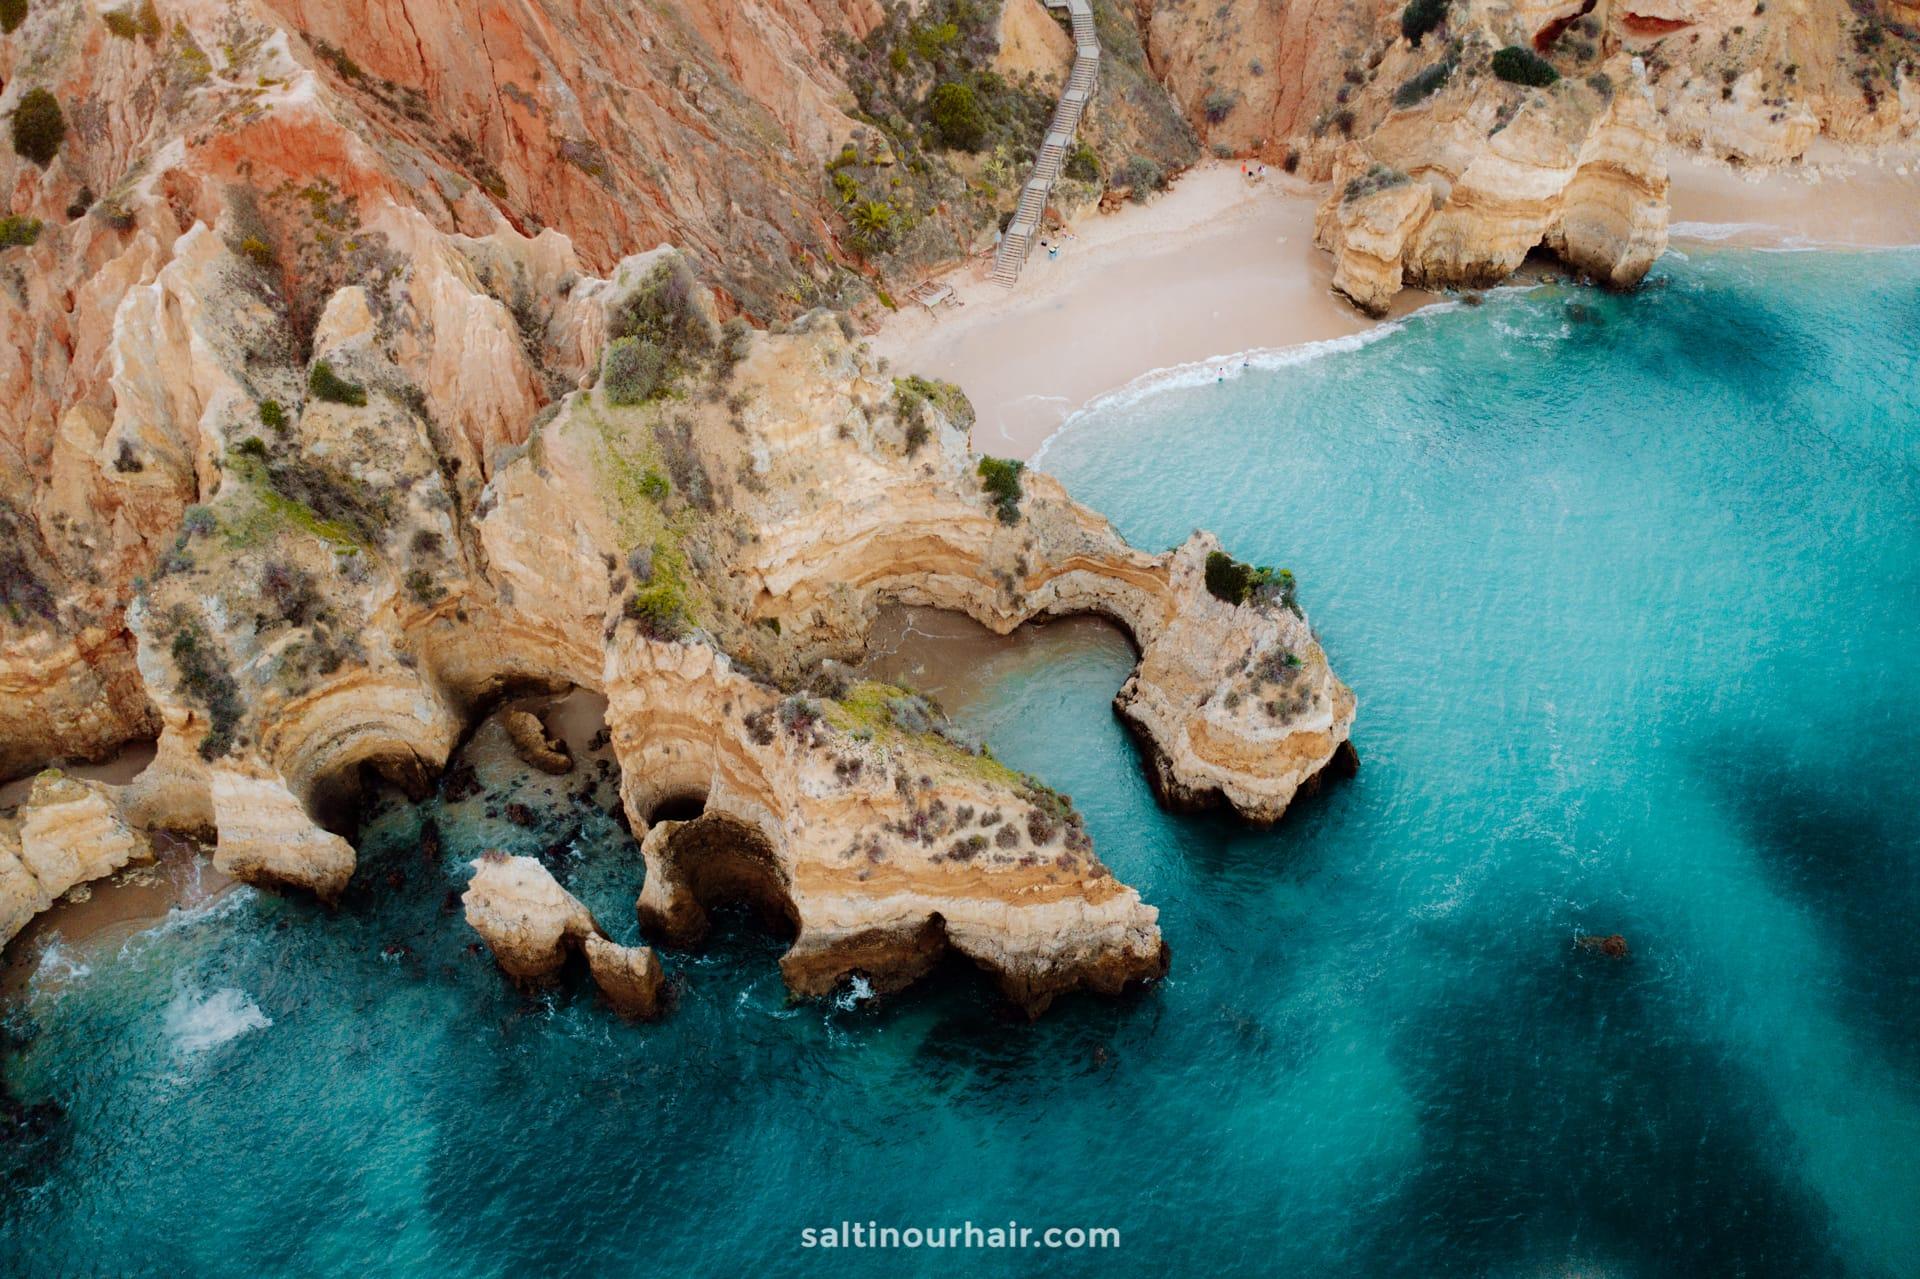 algarve most beautiful beaches Praia do Camilo